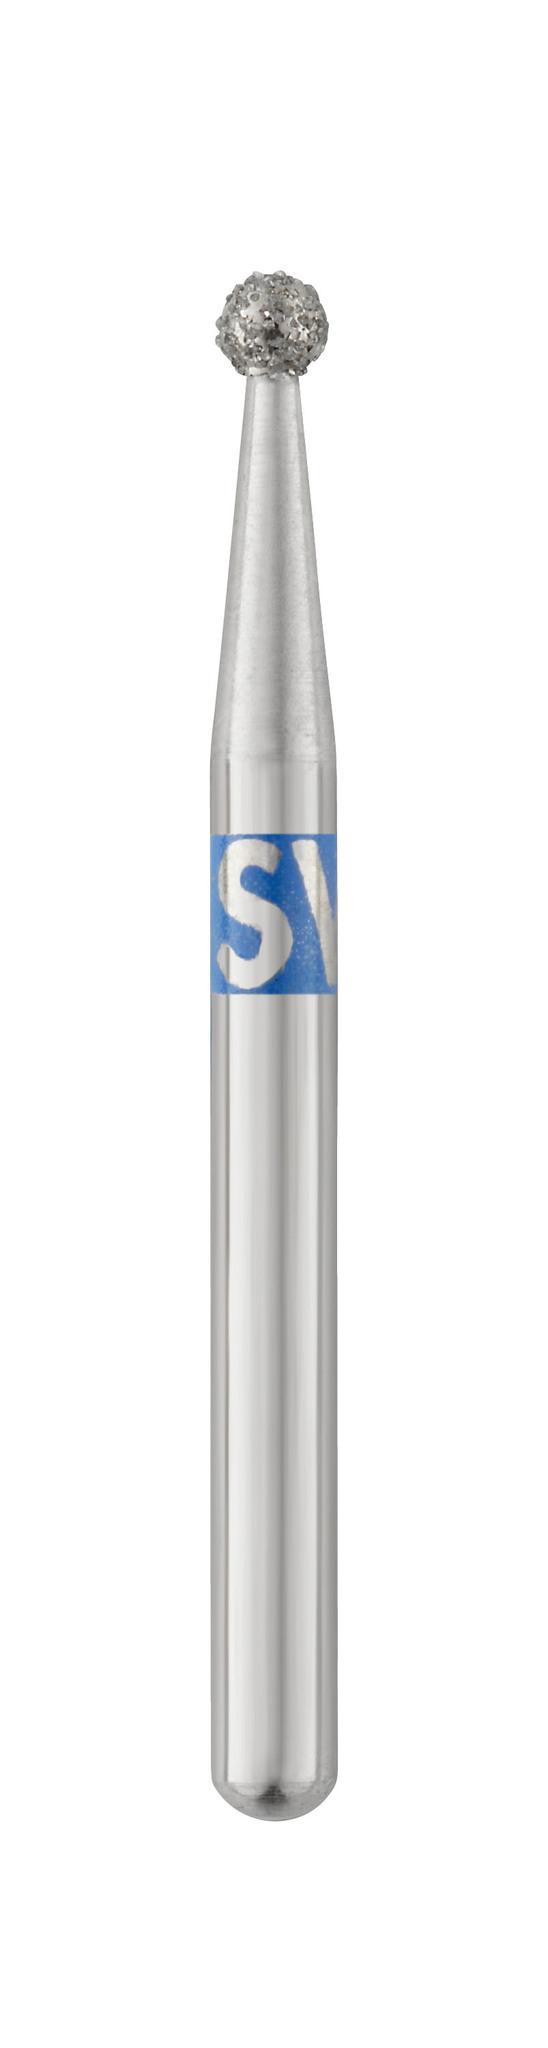 Алмазные боры Супер Финиры «SS WHITE» серия RA CS 801/014